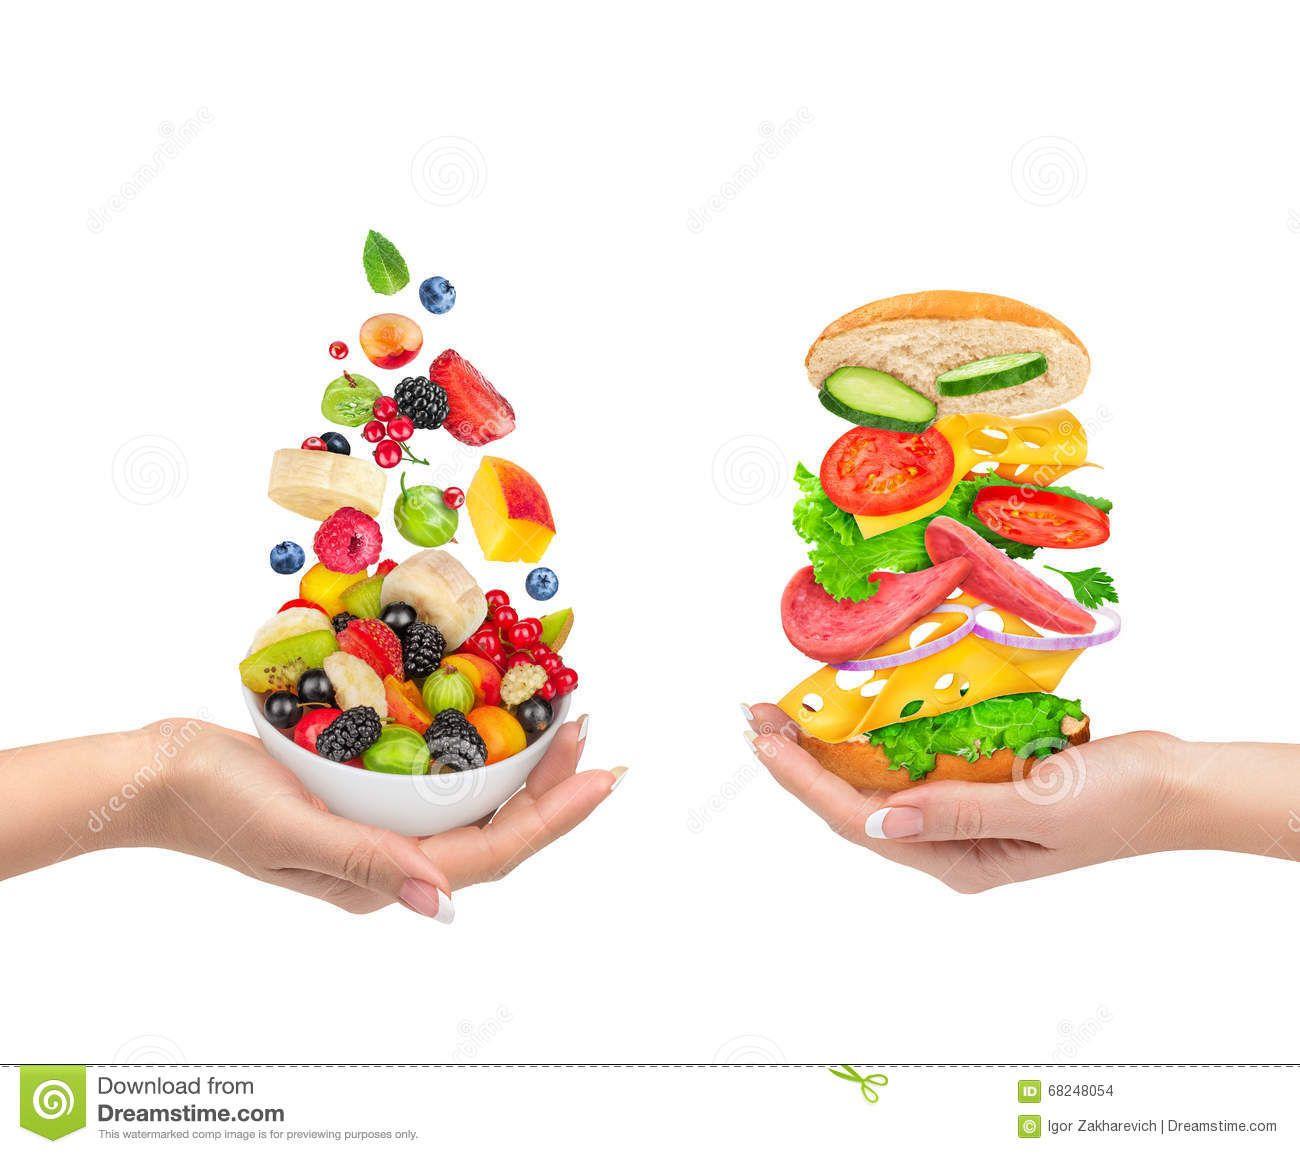 Healthy Vs Unhealthy Food Choices